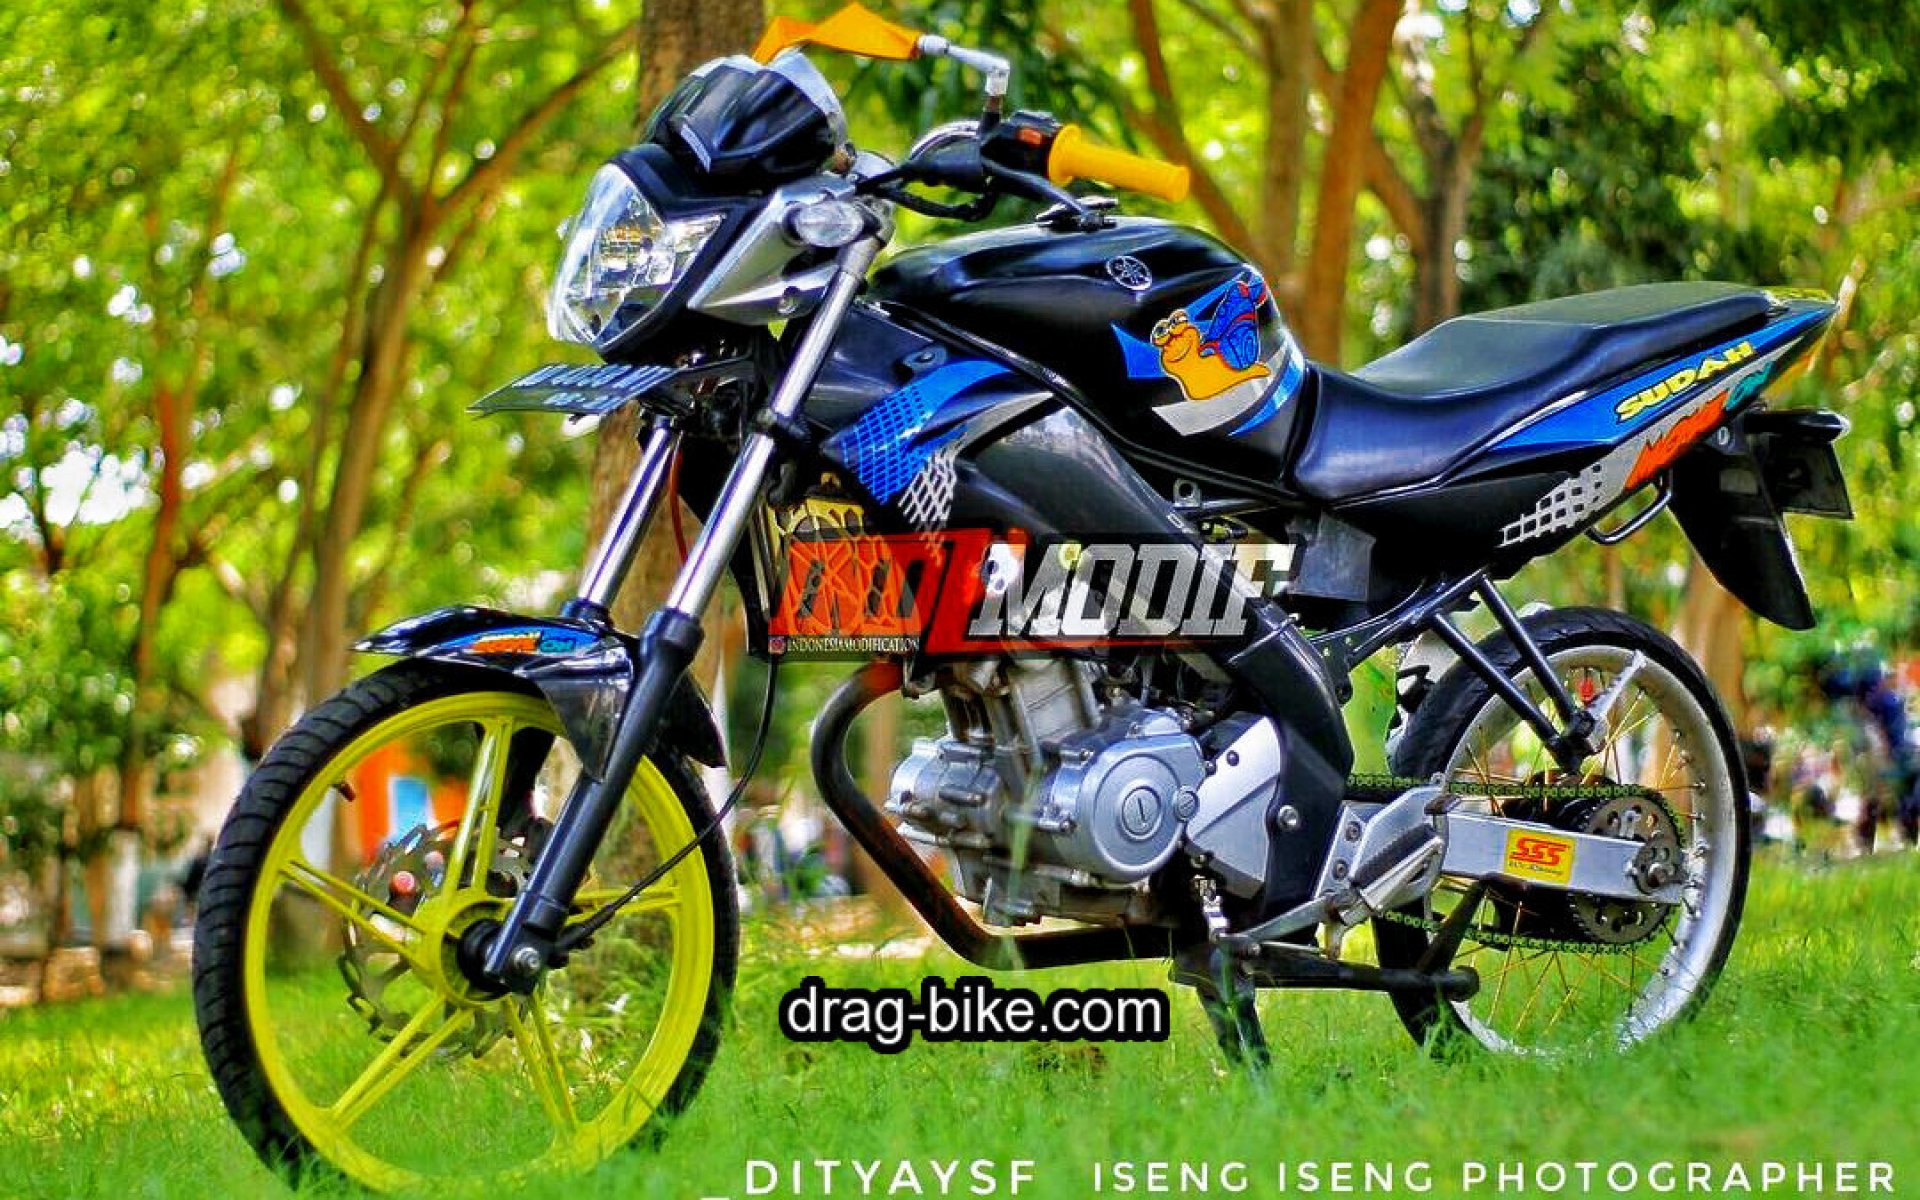 Gambar Modifikasi Motor Kontes Vega Zr